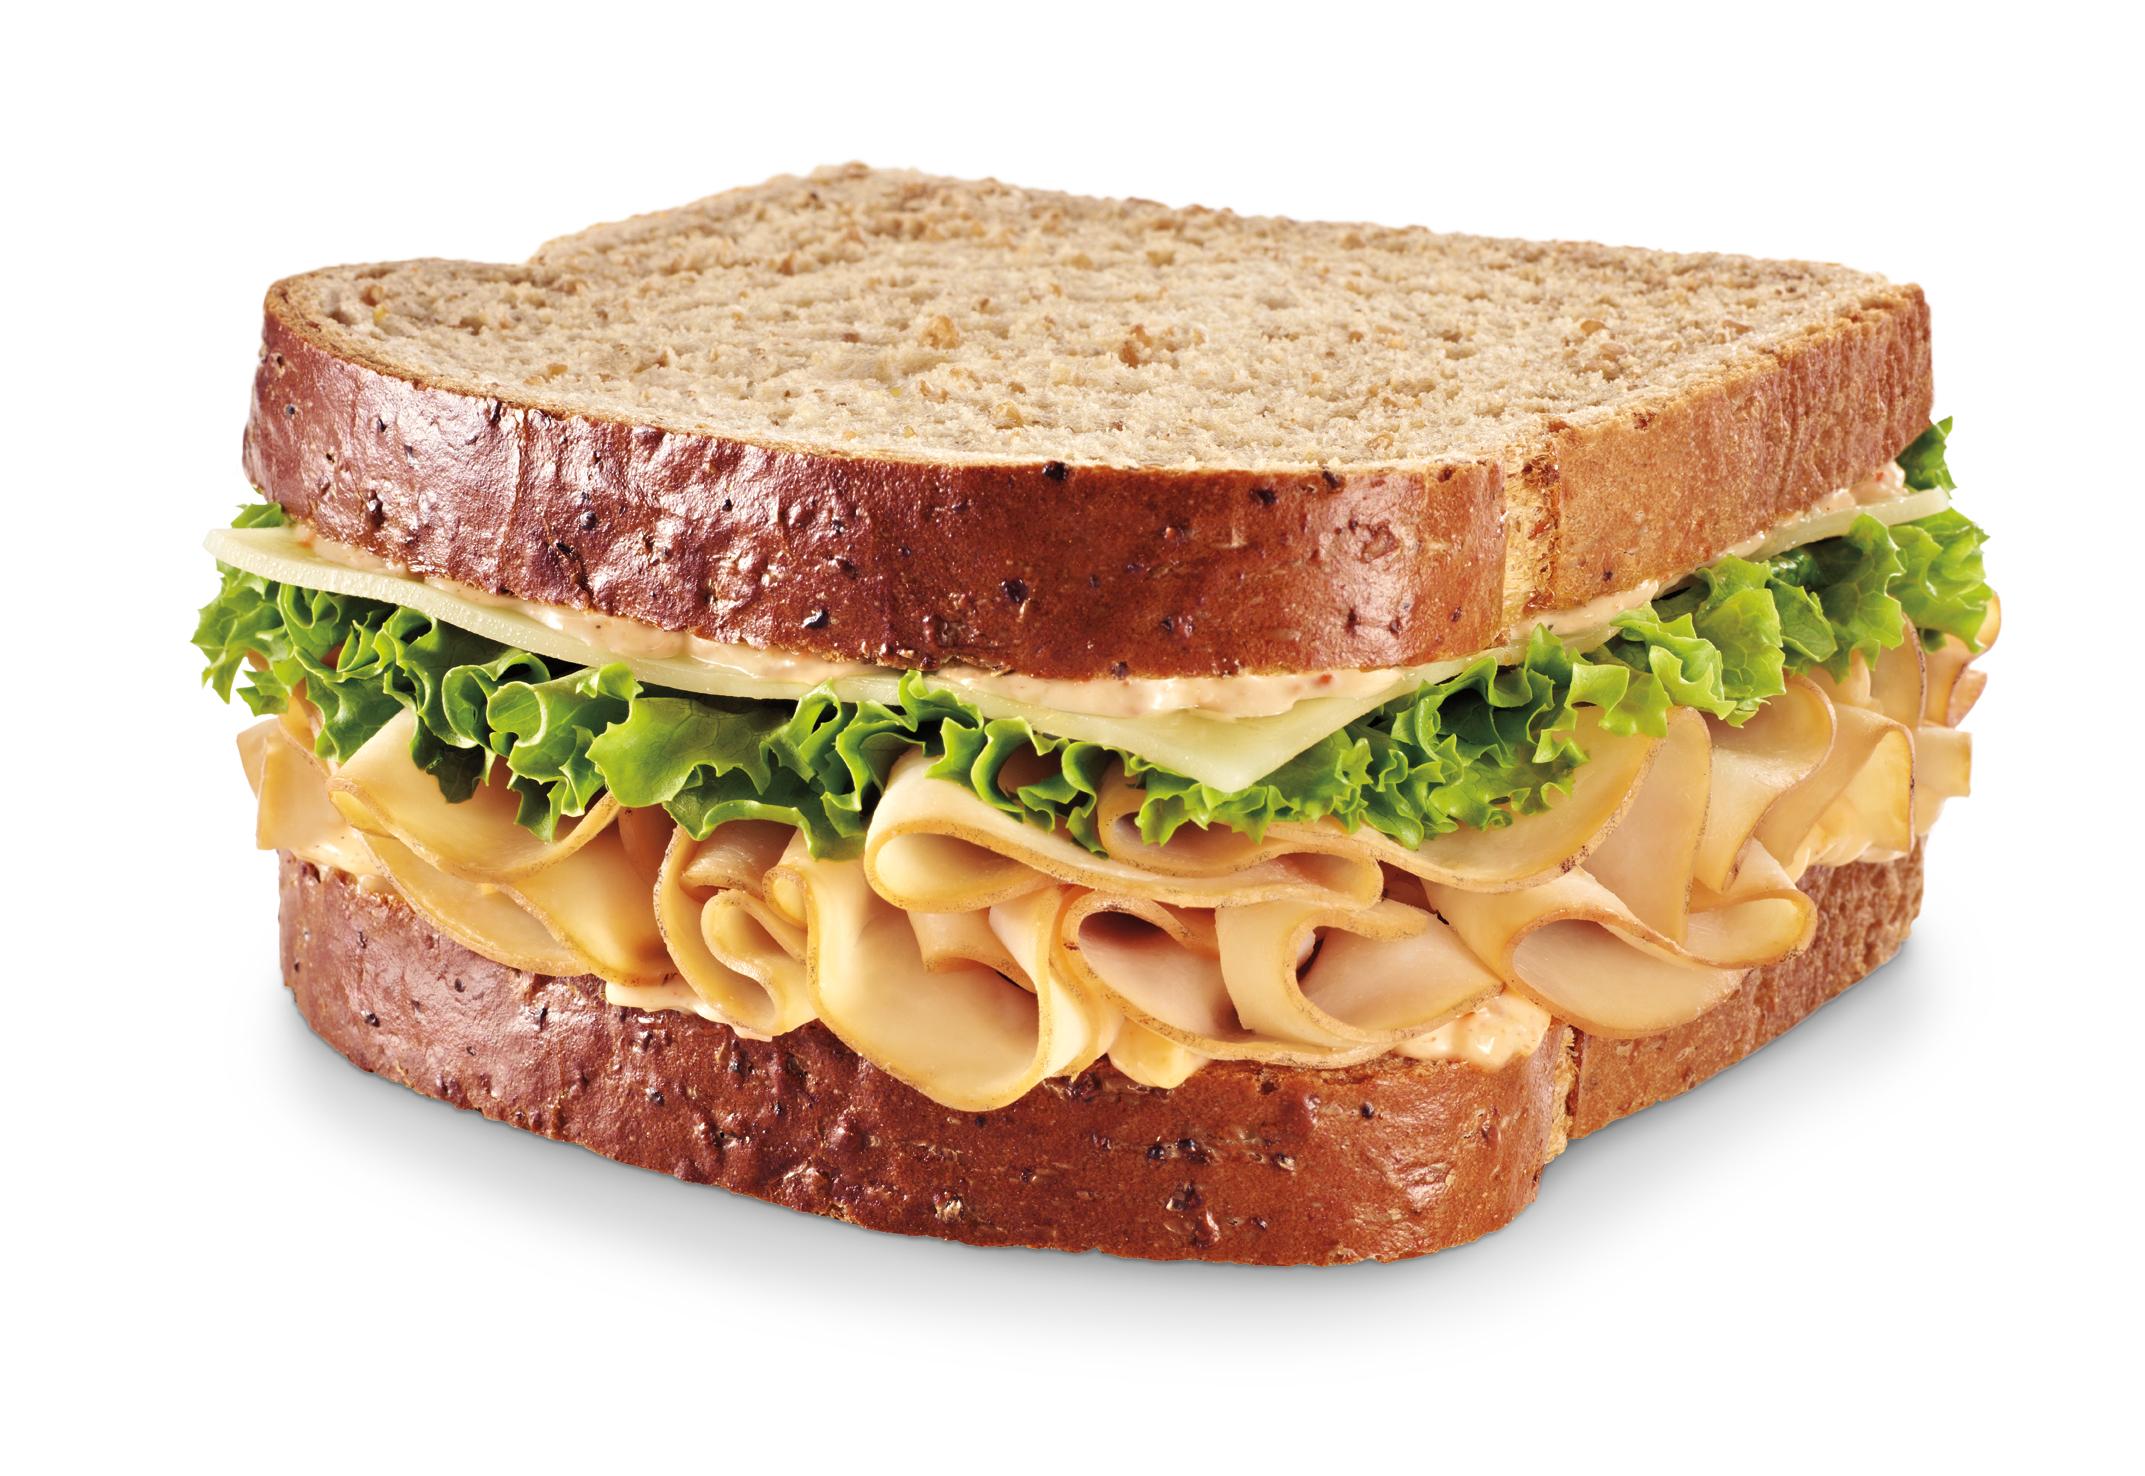 Turkey And Cheese Sandwich On Wheat Bread 7-eleven, 7 eleven, sandwich ...